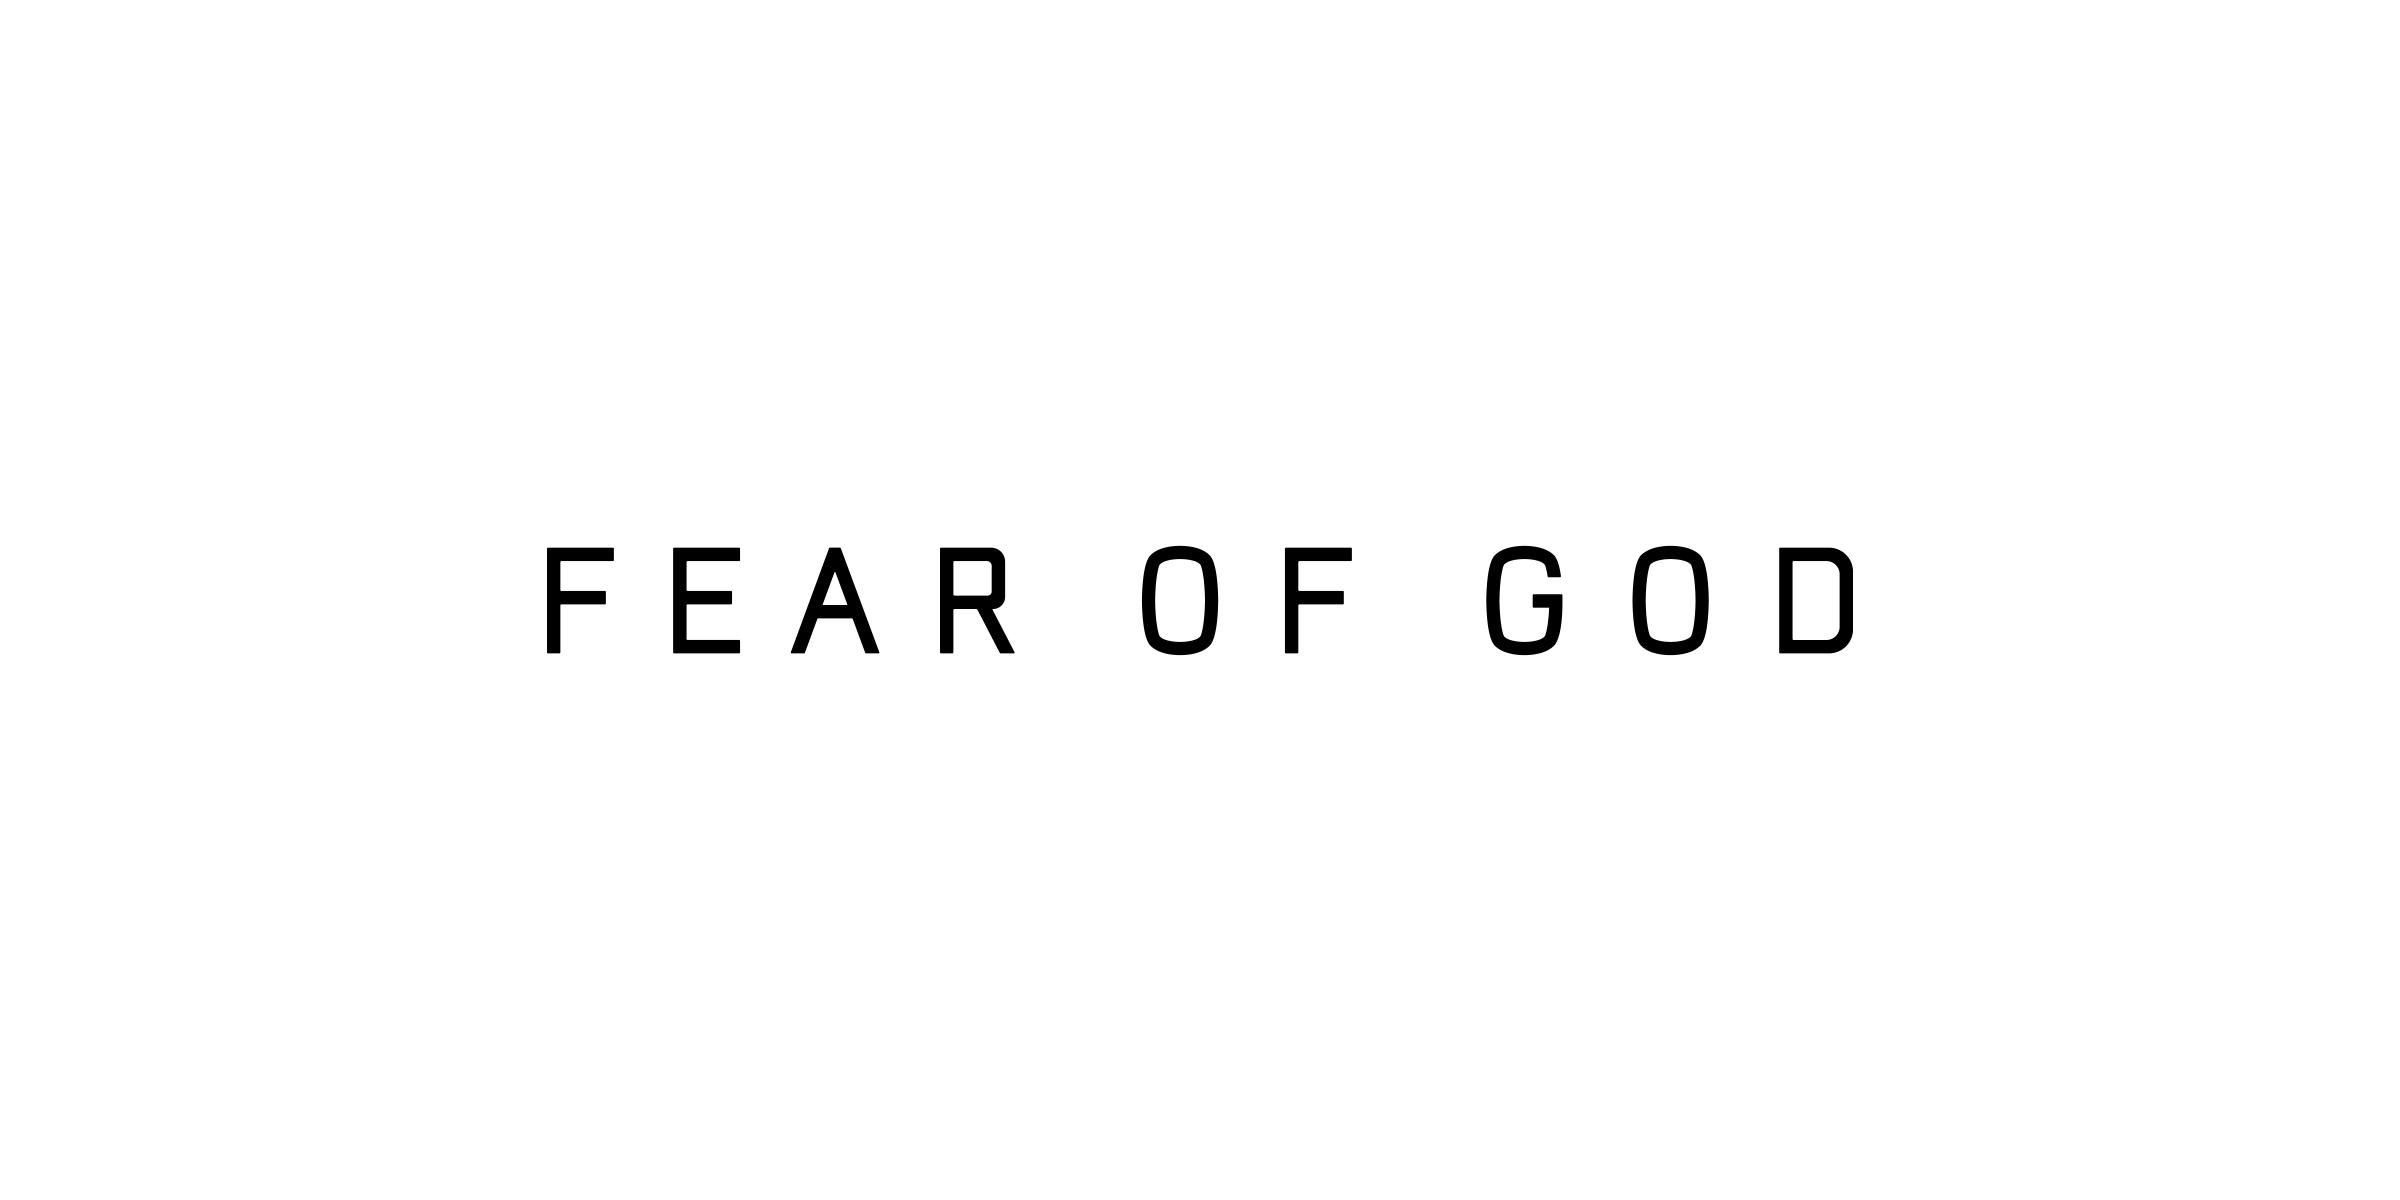 NIKE AIR FEAR OF GOD.